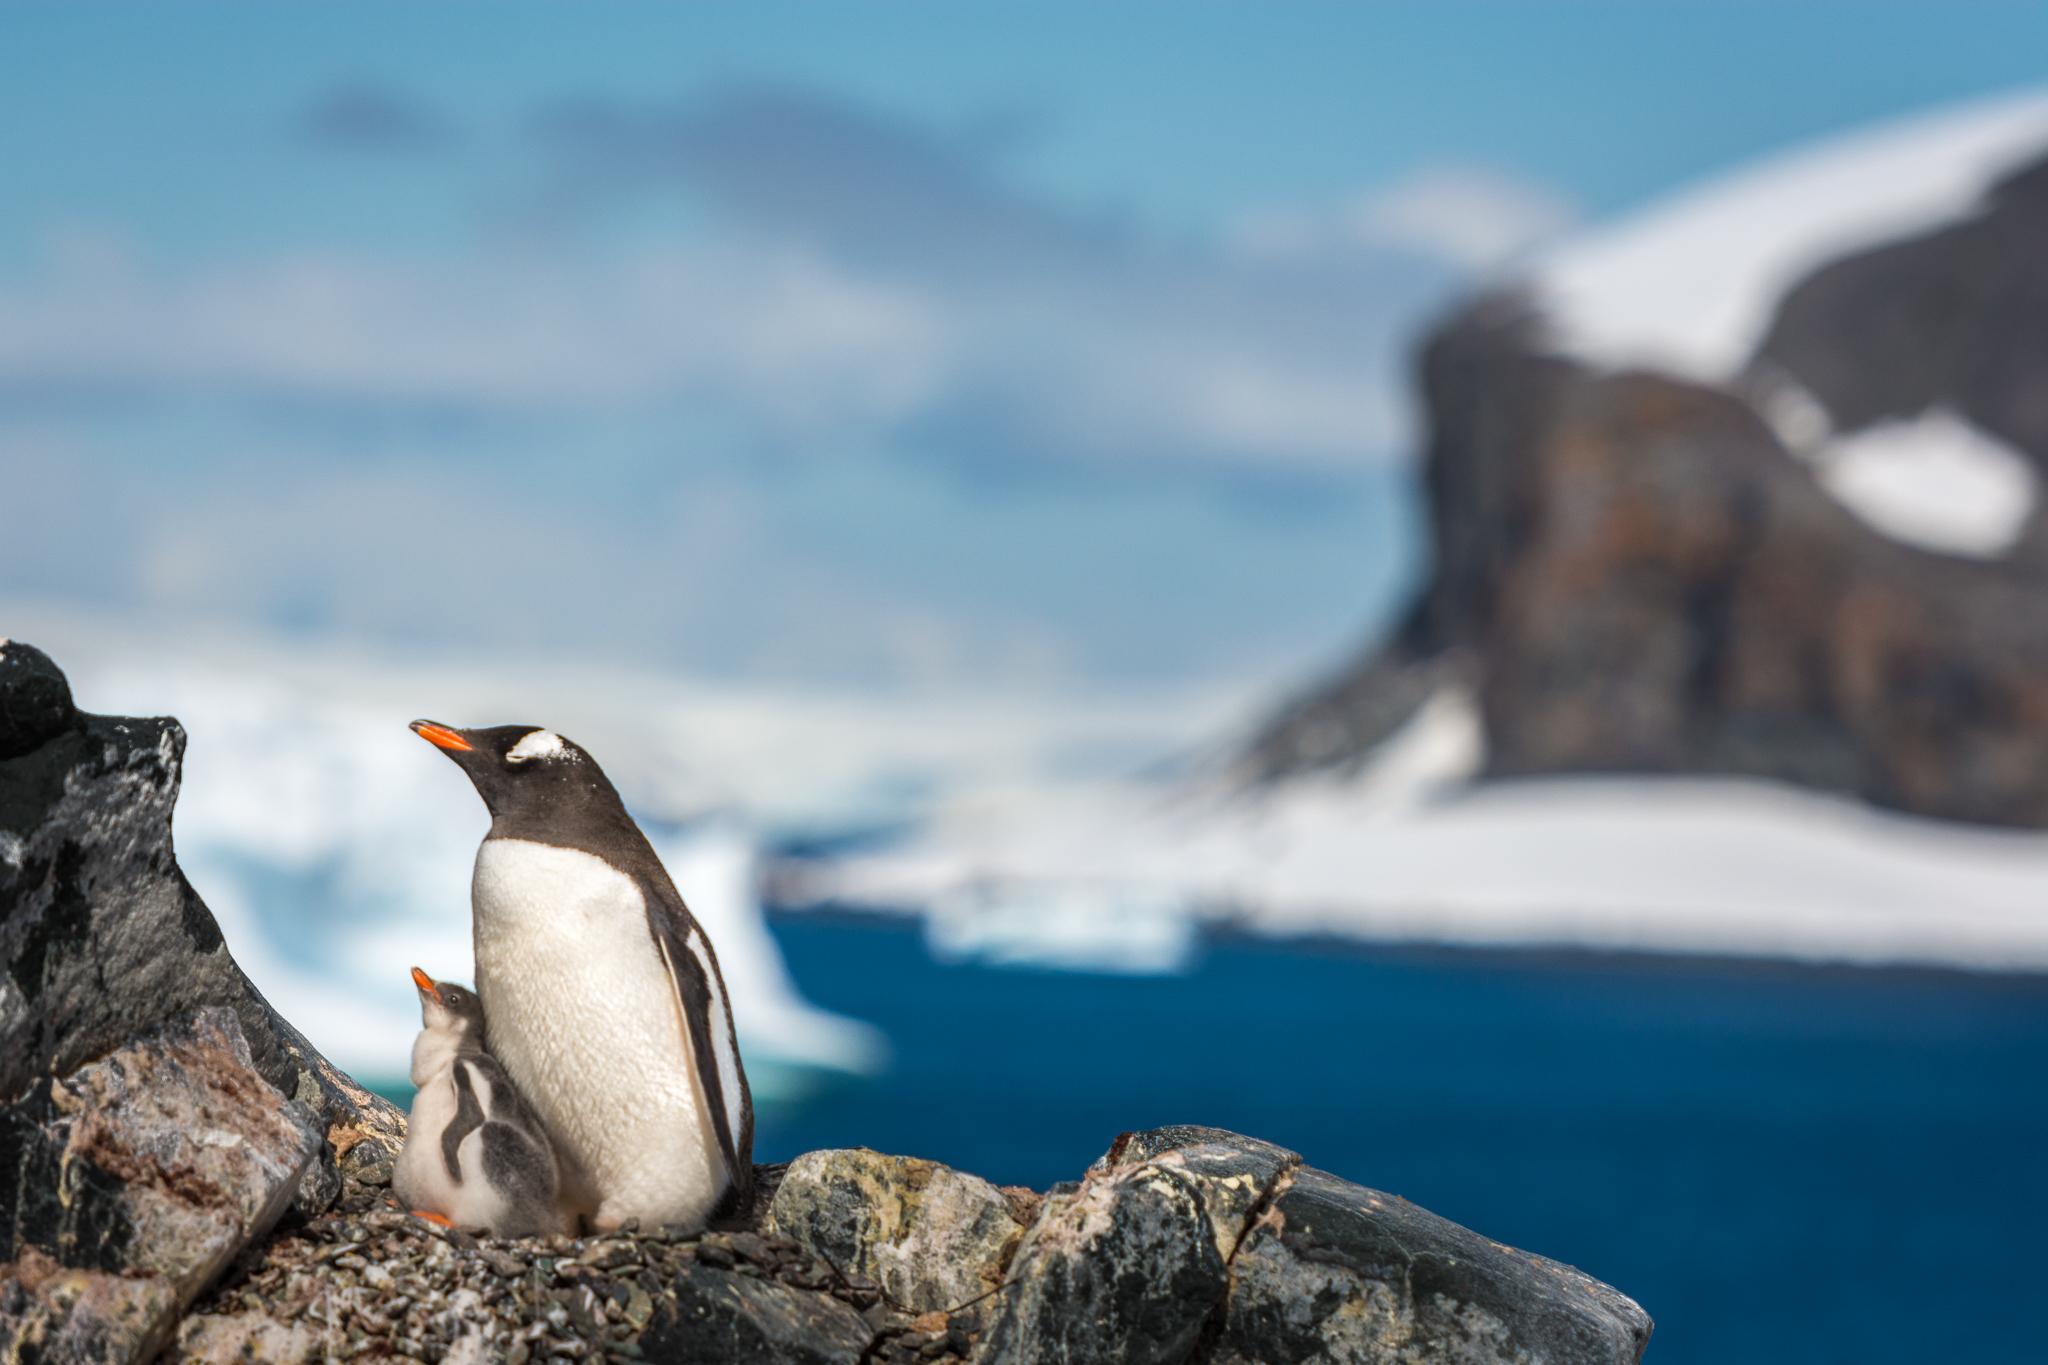 penguinandbaby.jpg